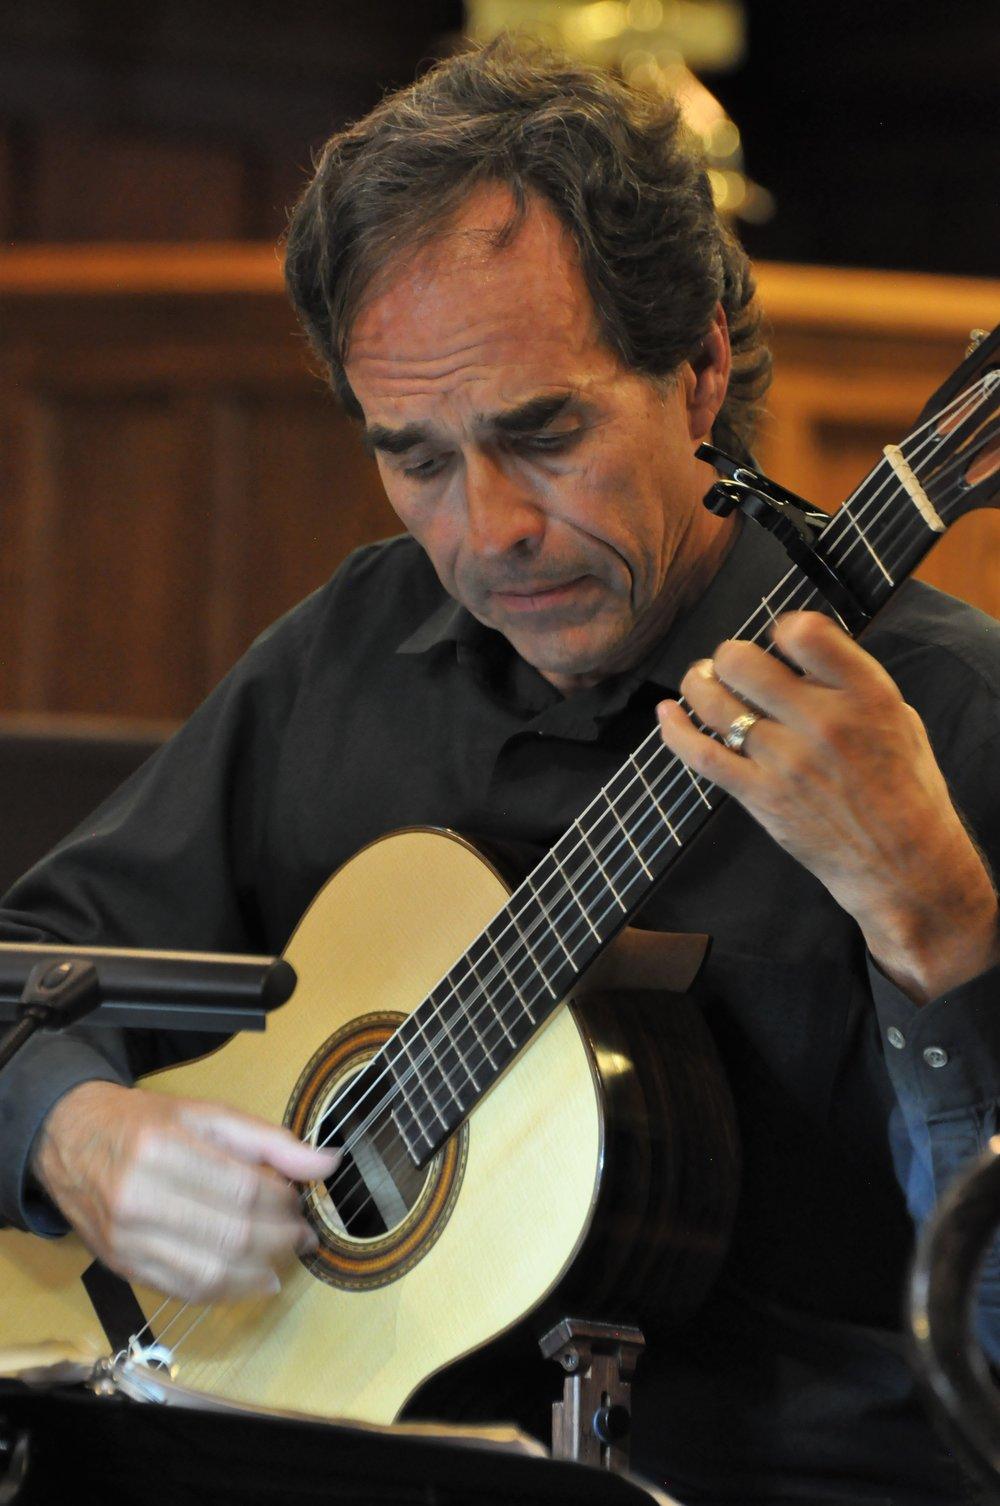 Alan Rinehart